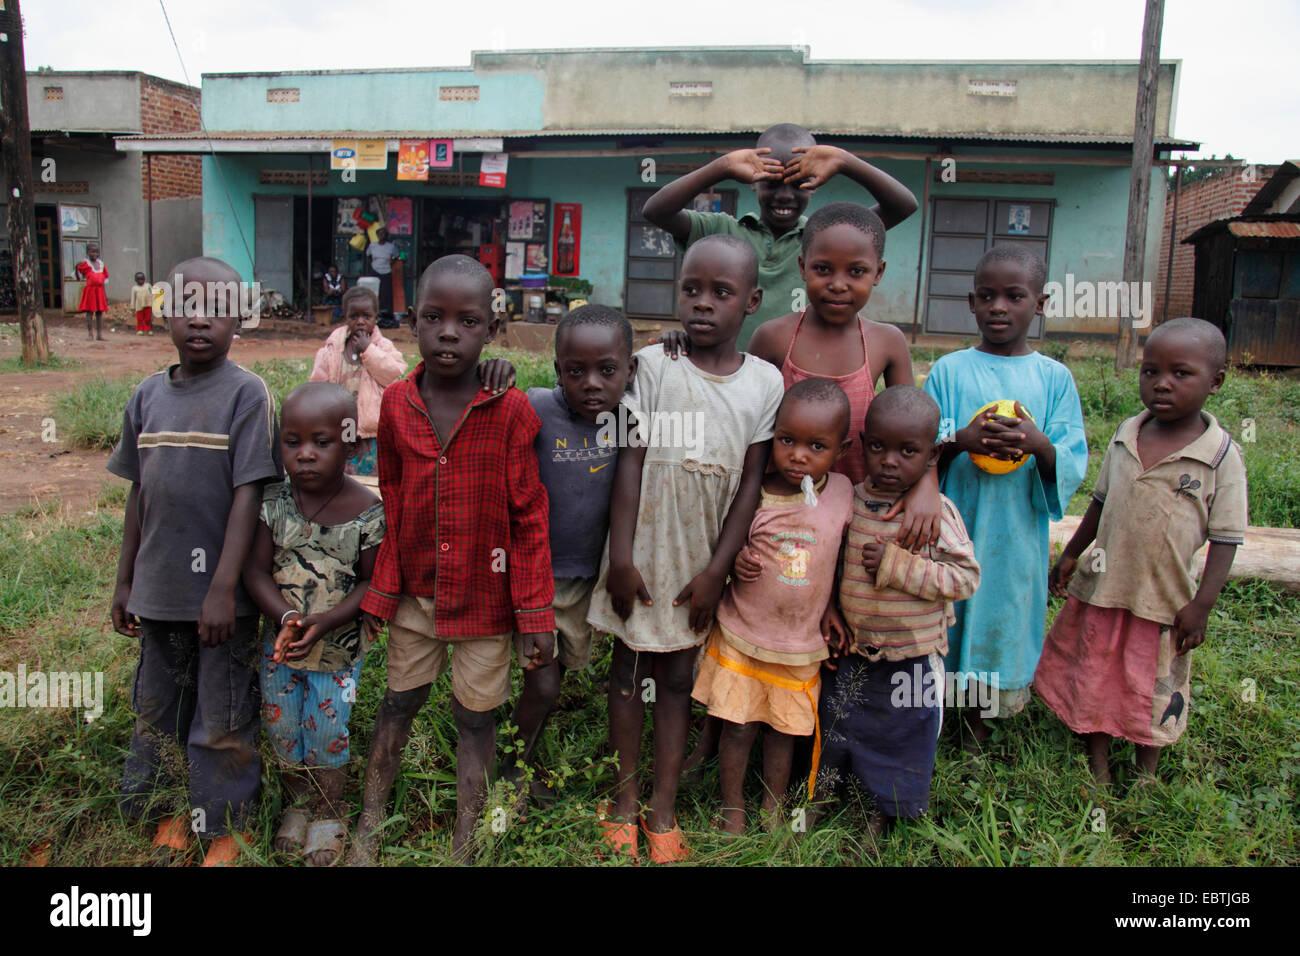 group of african children, Uganda Stock Photo